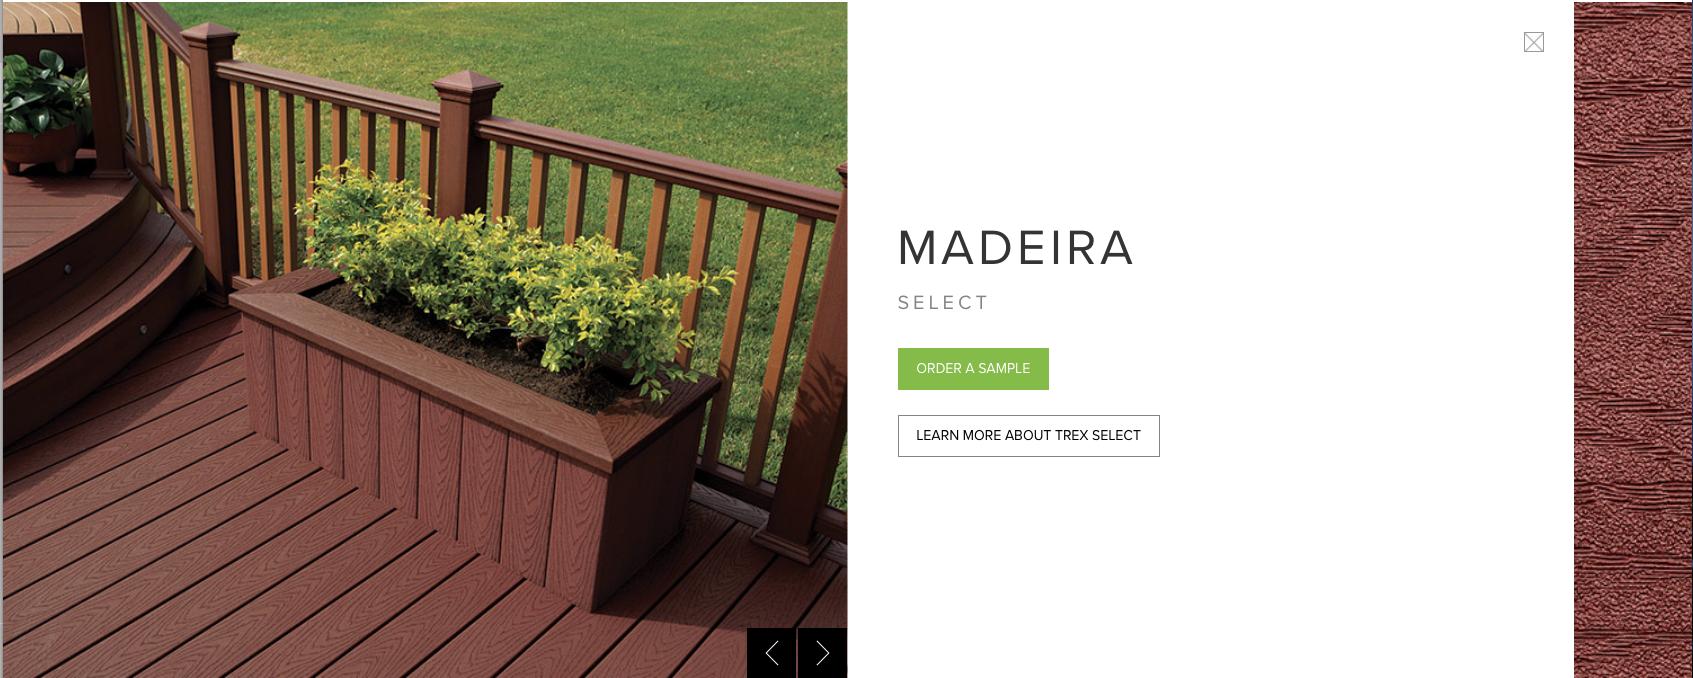 Trex Select Madeira